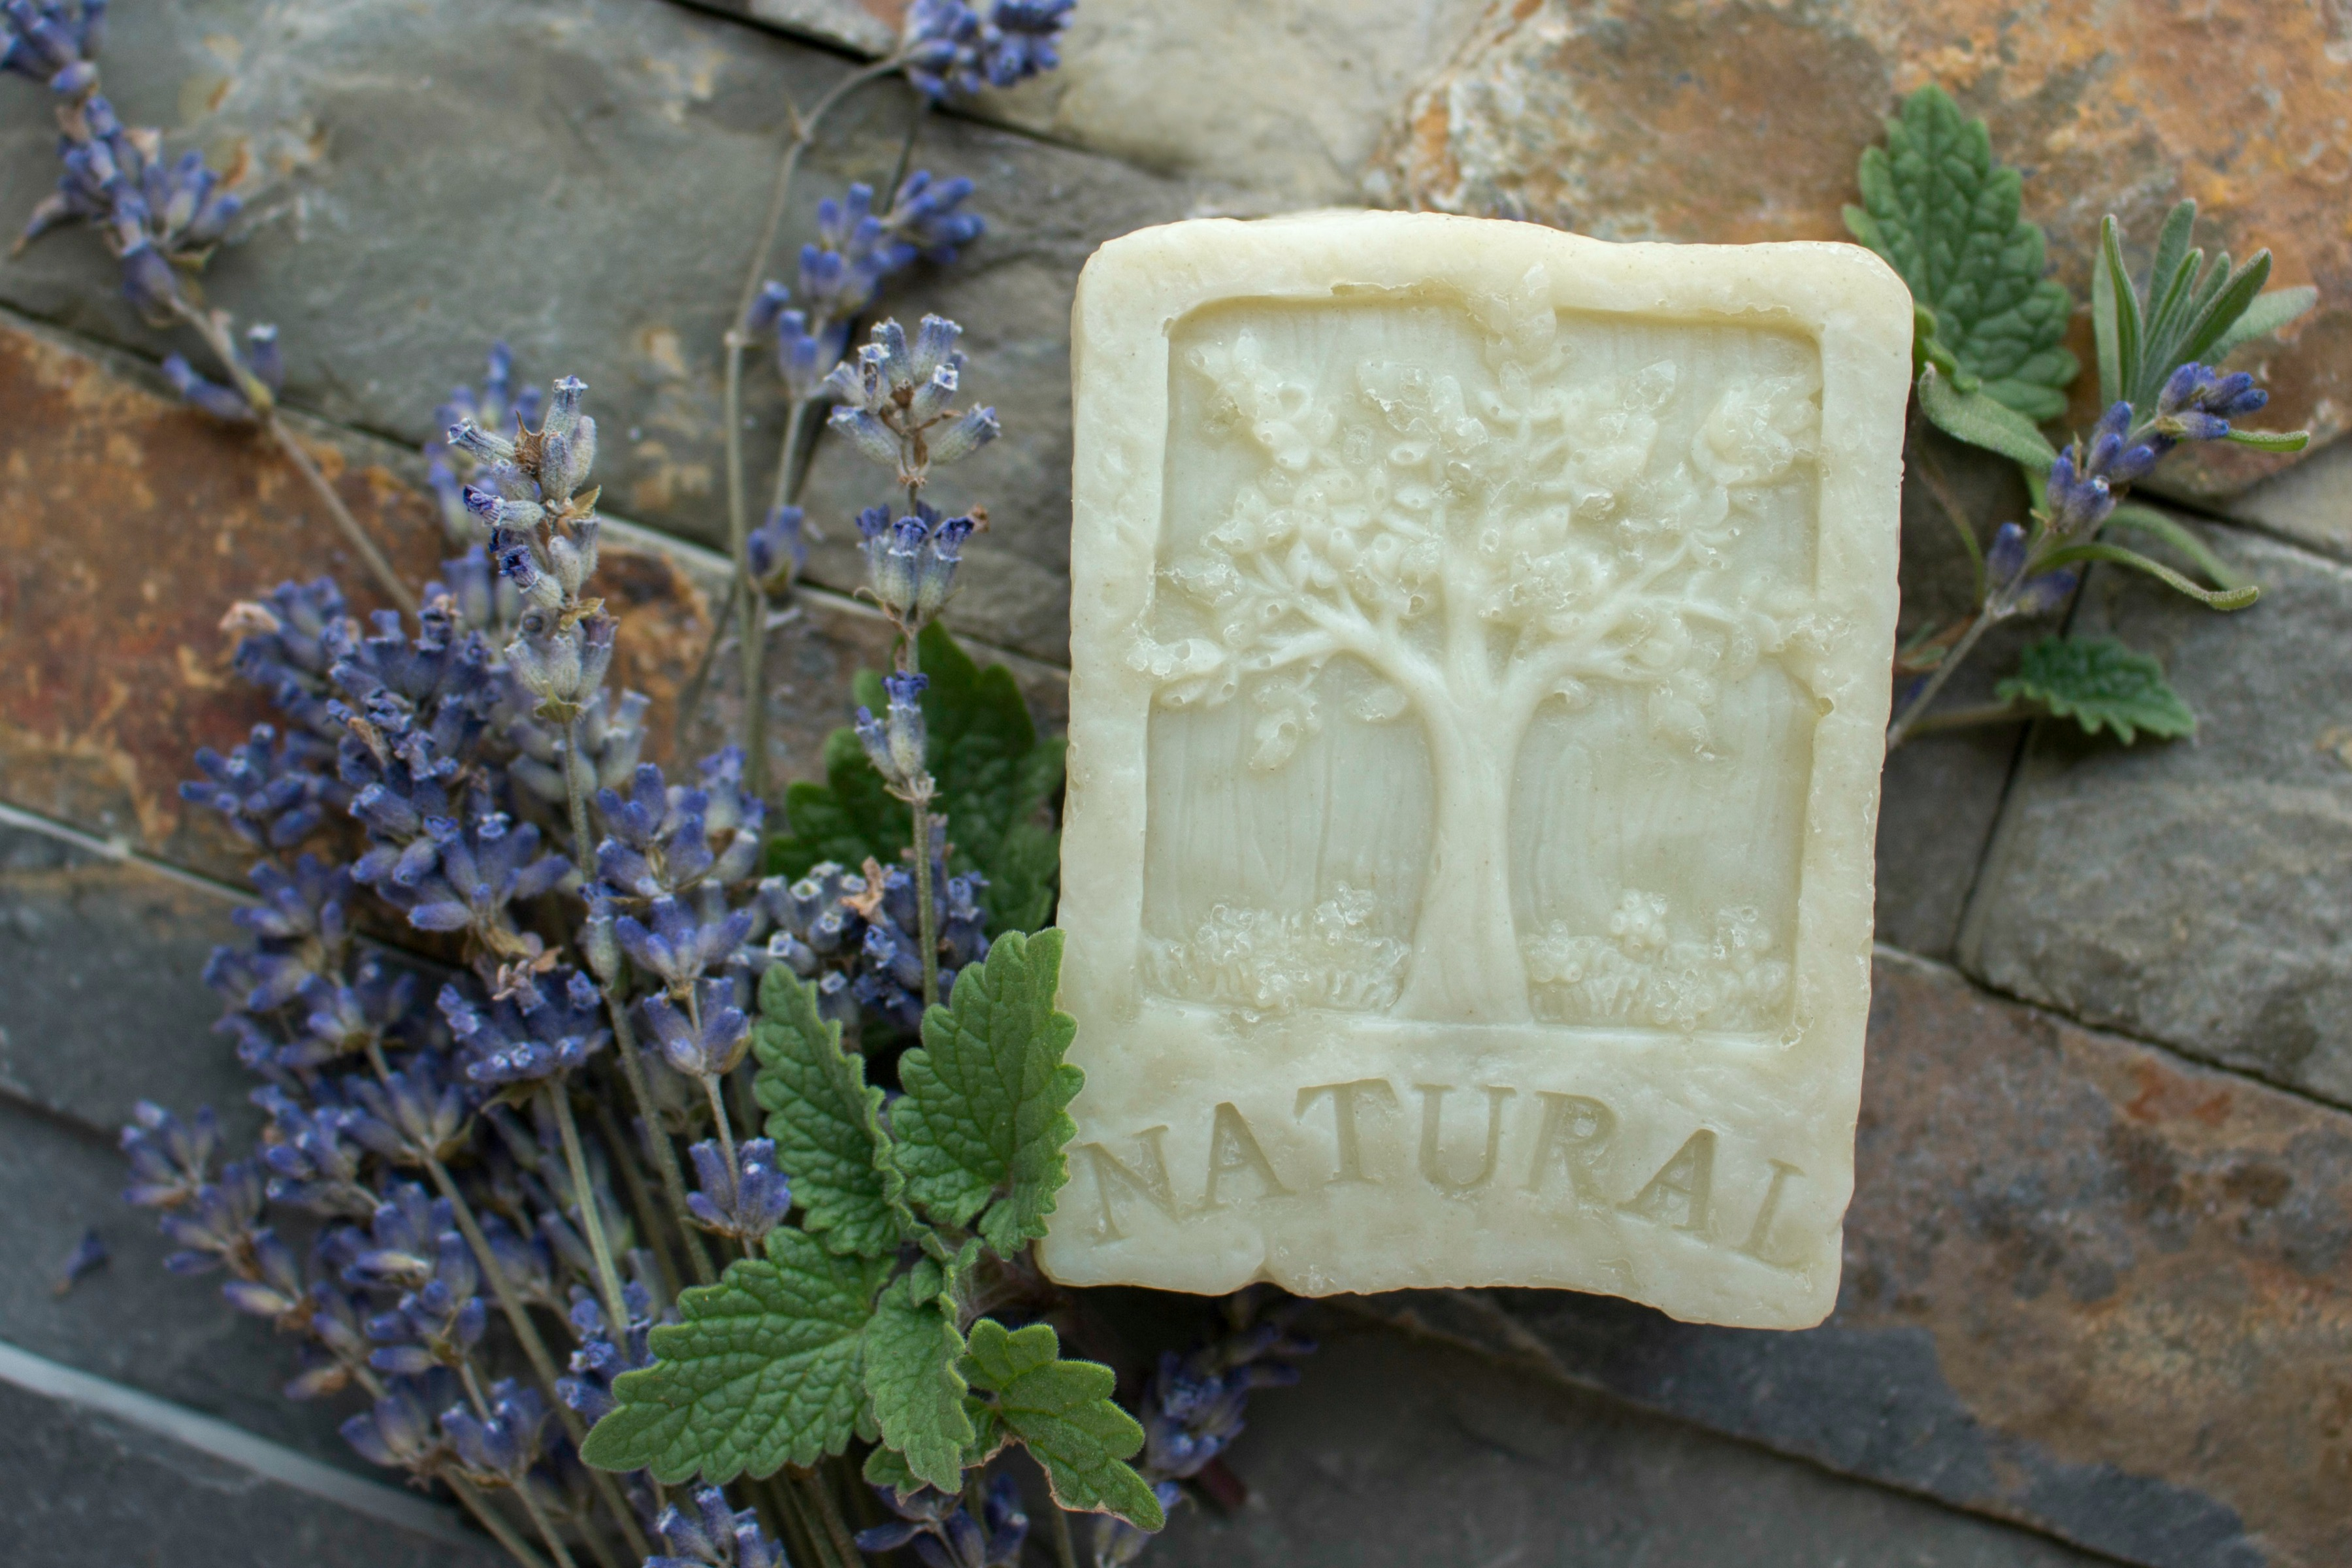 Natural homemade soap made laying with fresh herbs on bricks